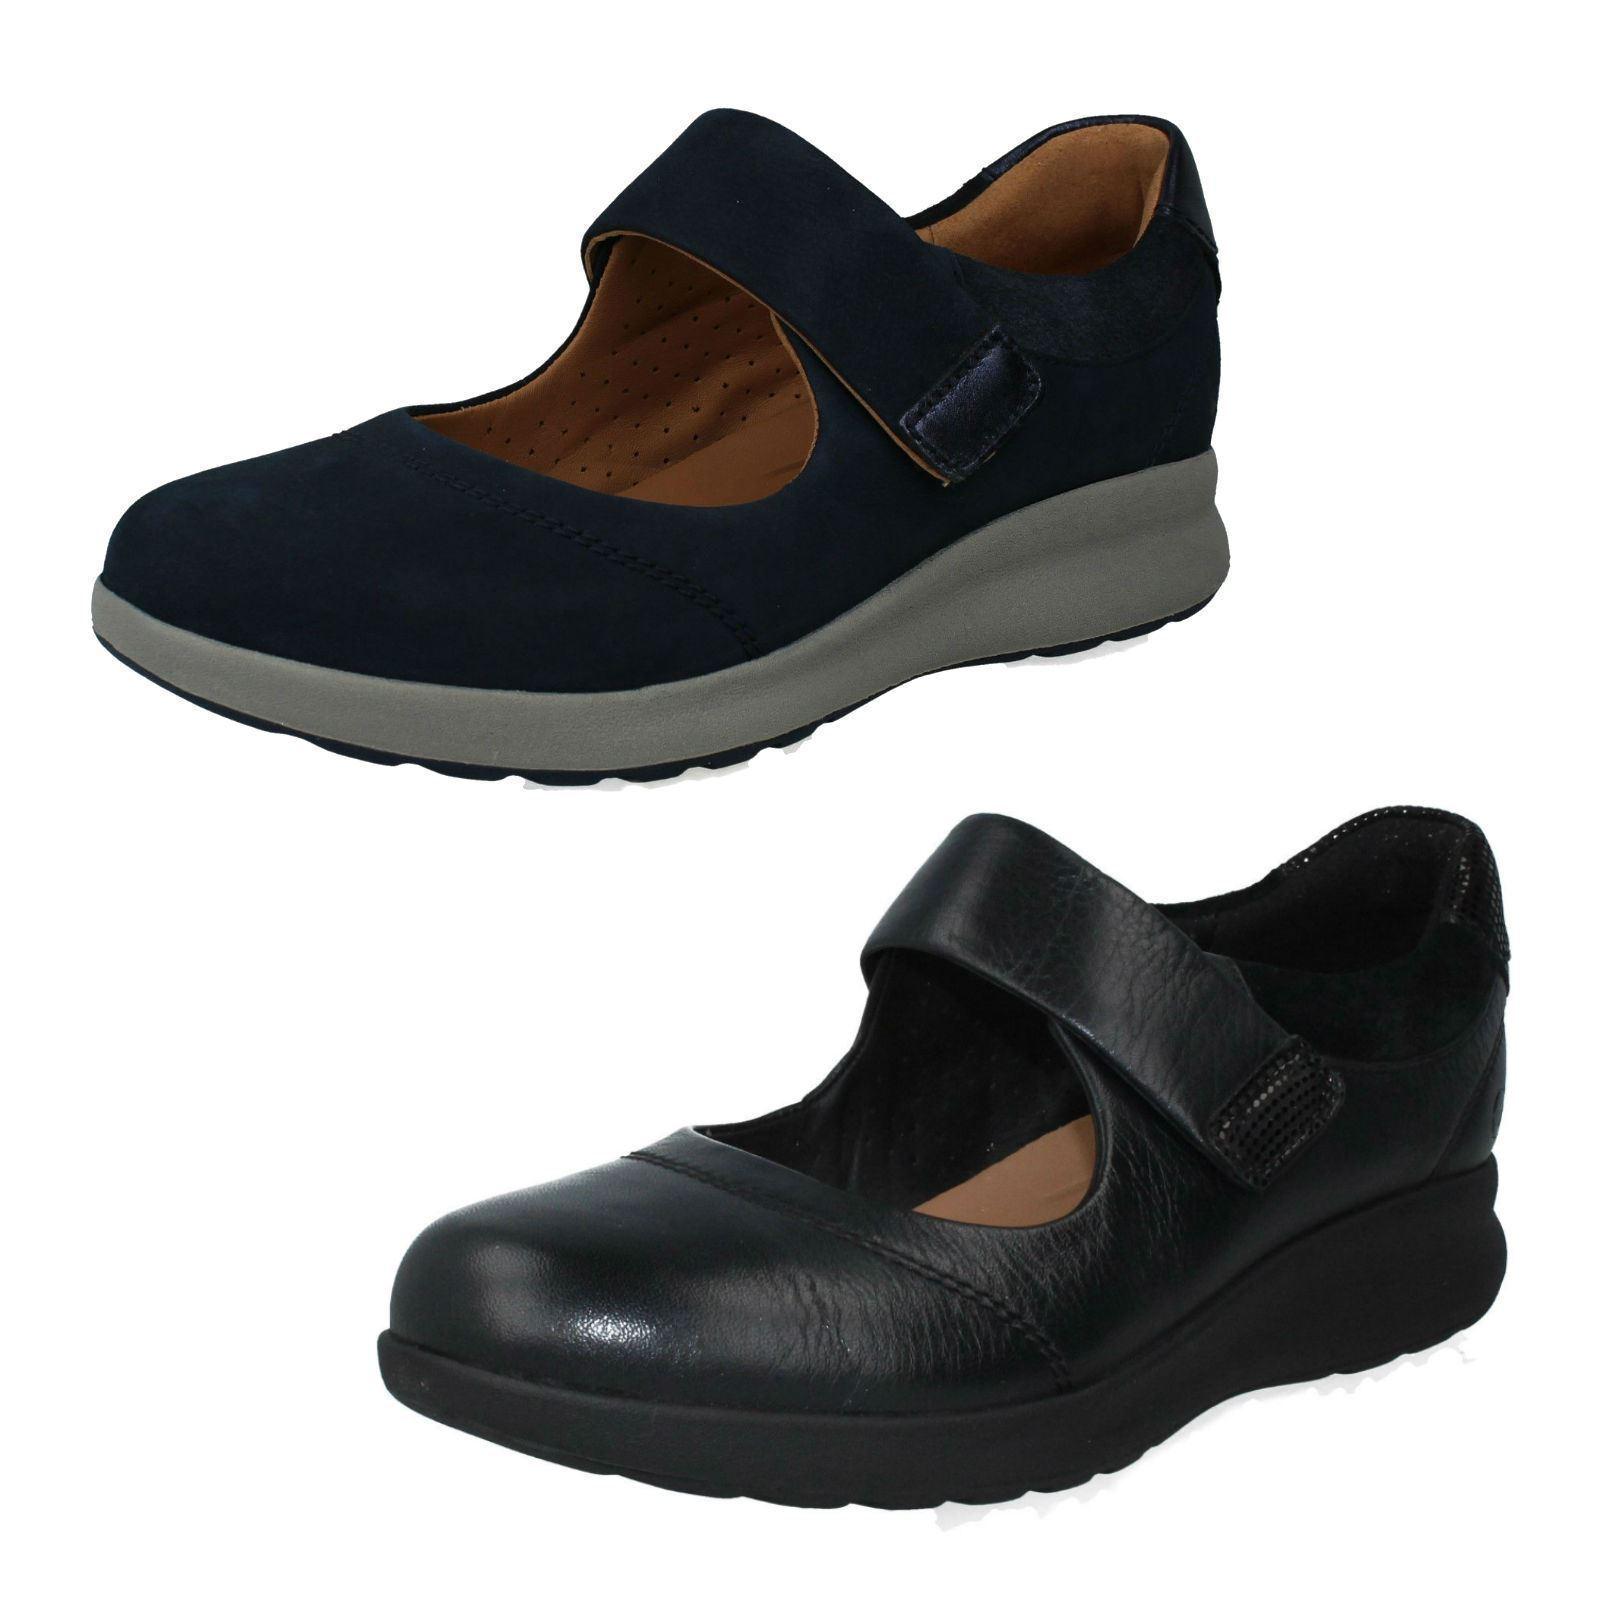 Clarks Mujer sin Estructura Zapatos ' Onu Adornos Tira Tira Tira '  el estilo clásico